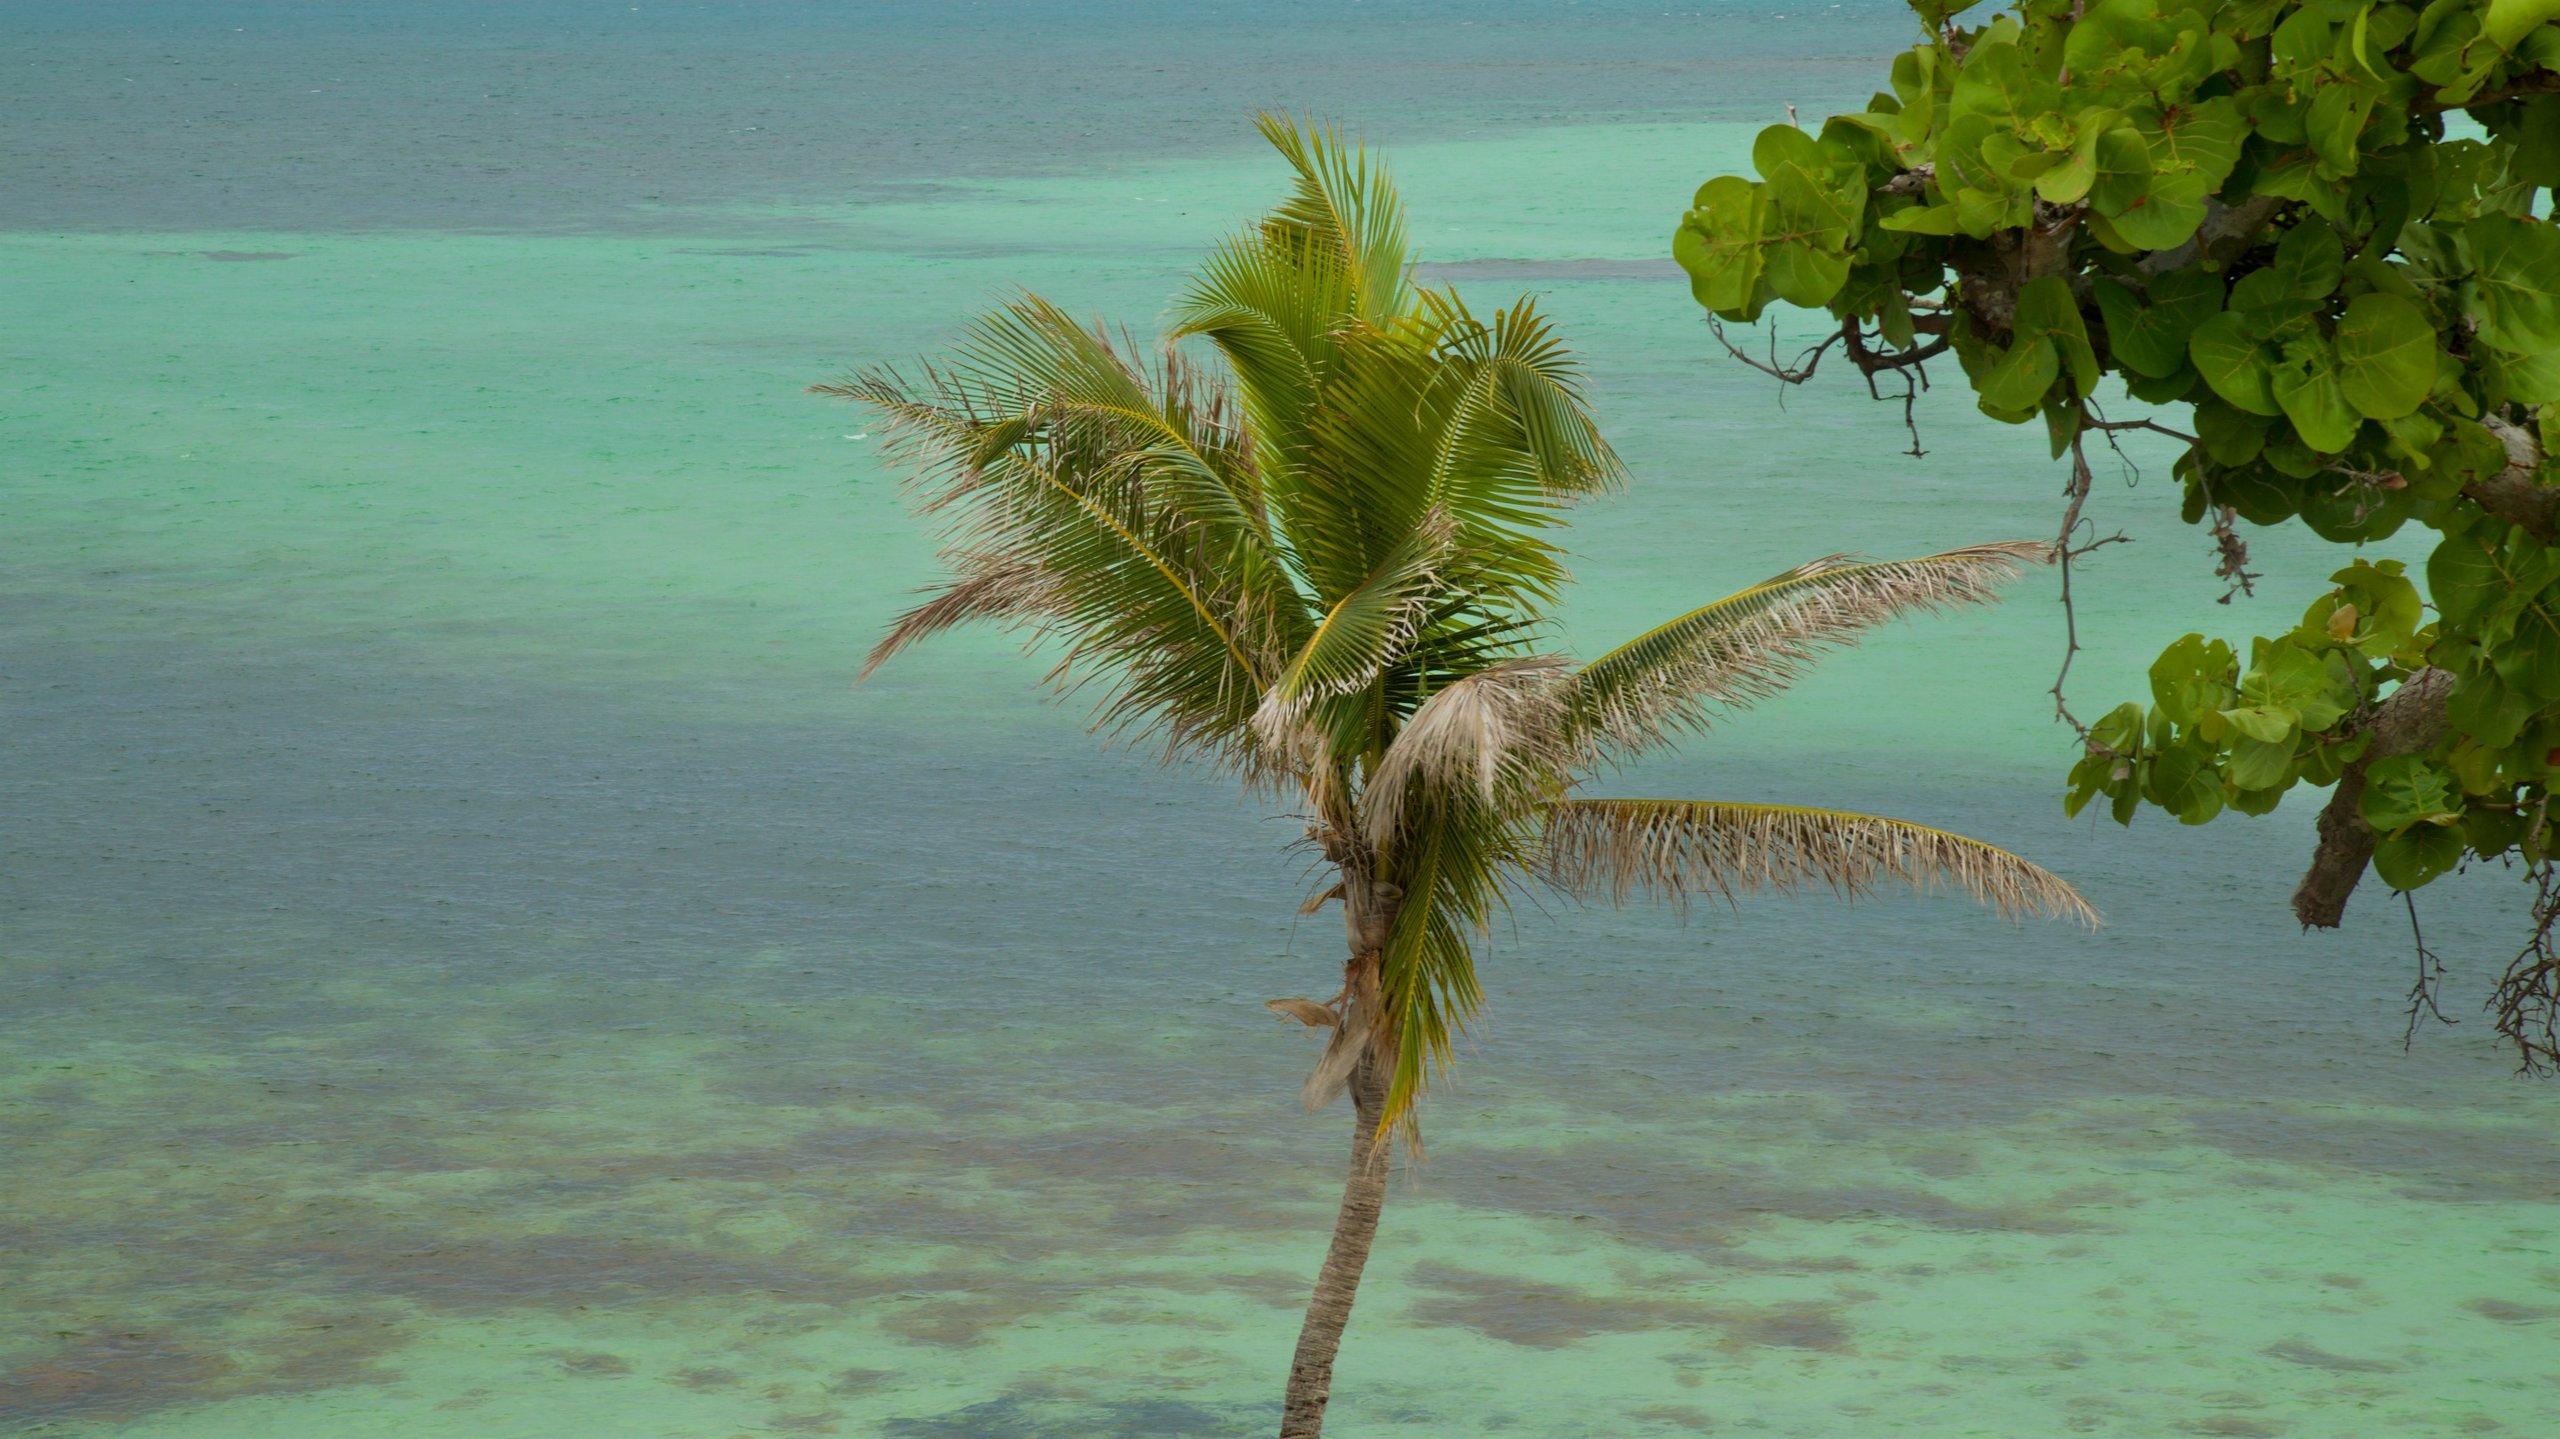 Bahia Honda State Park and Beach, Big Pine Key, Florida, United States of America